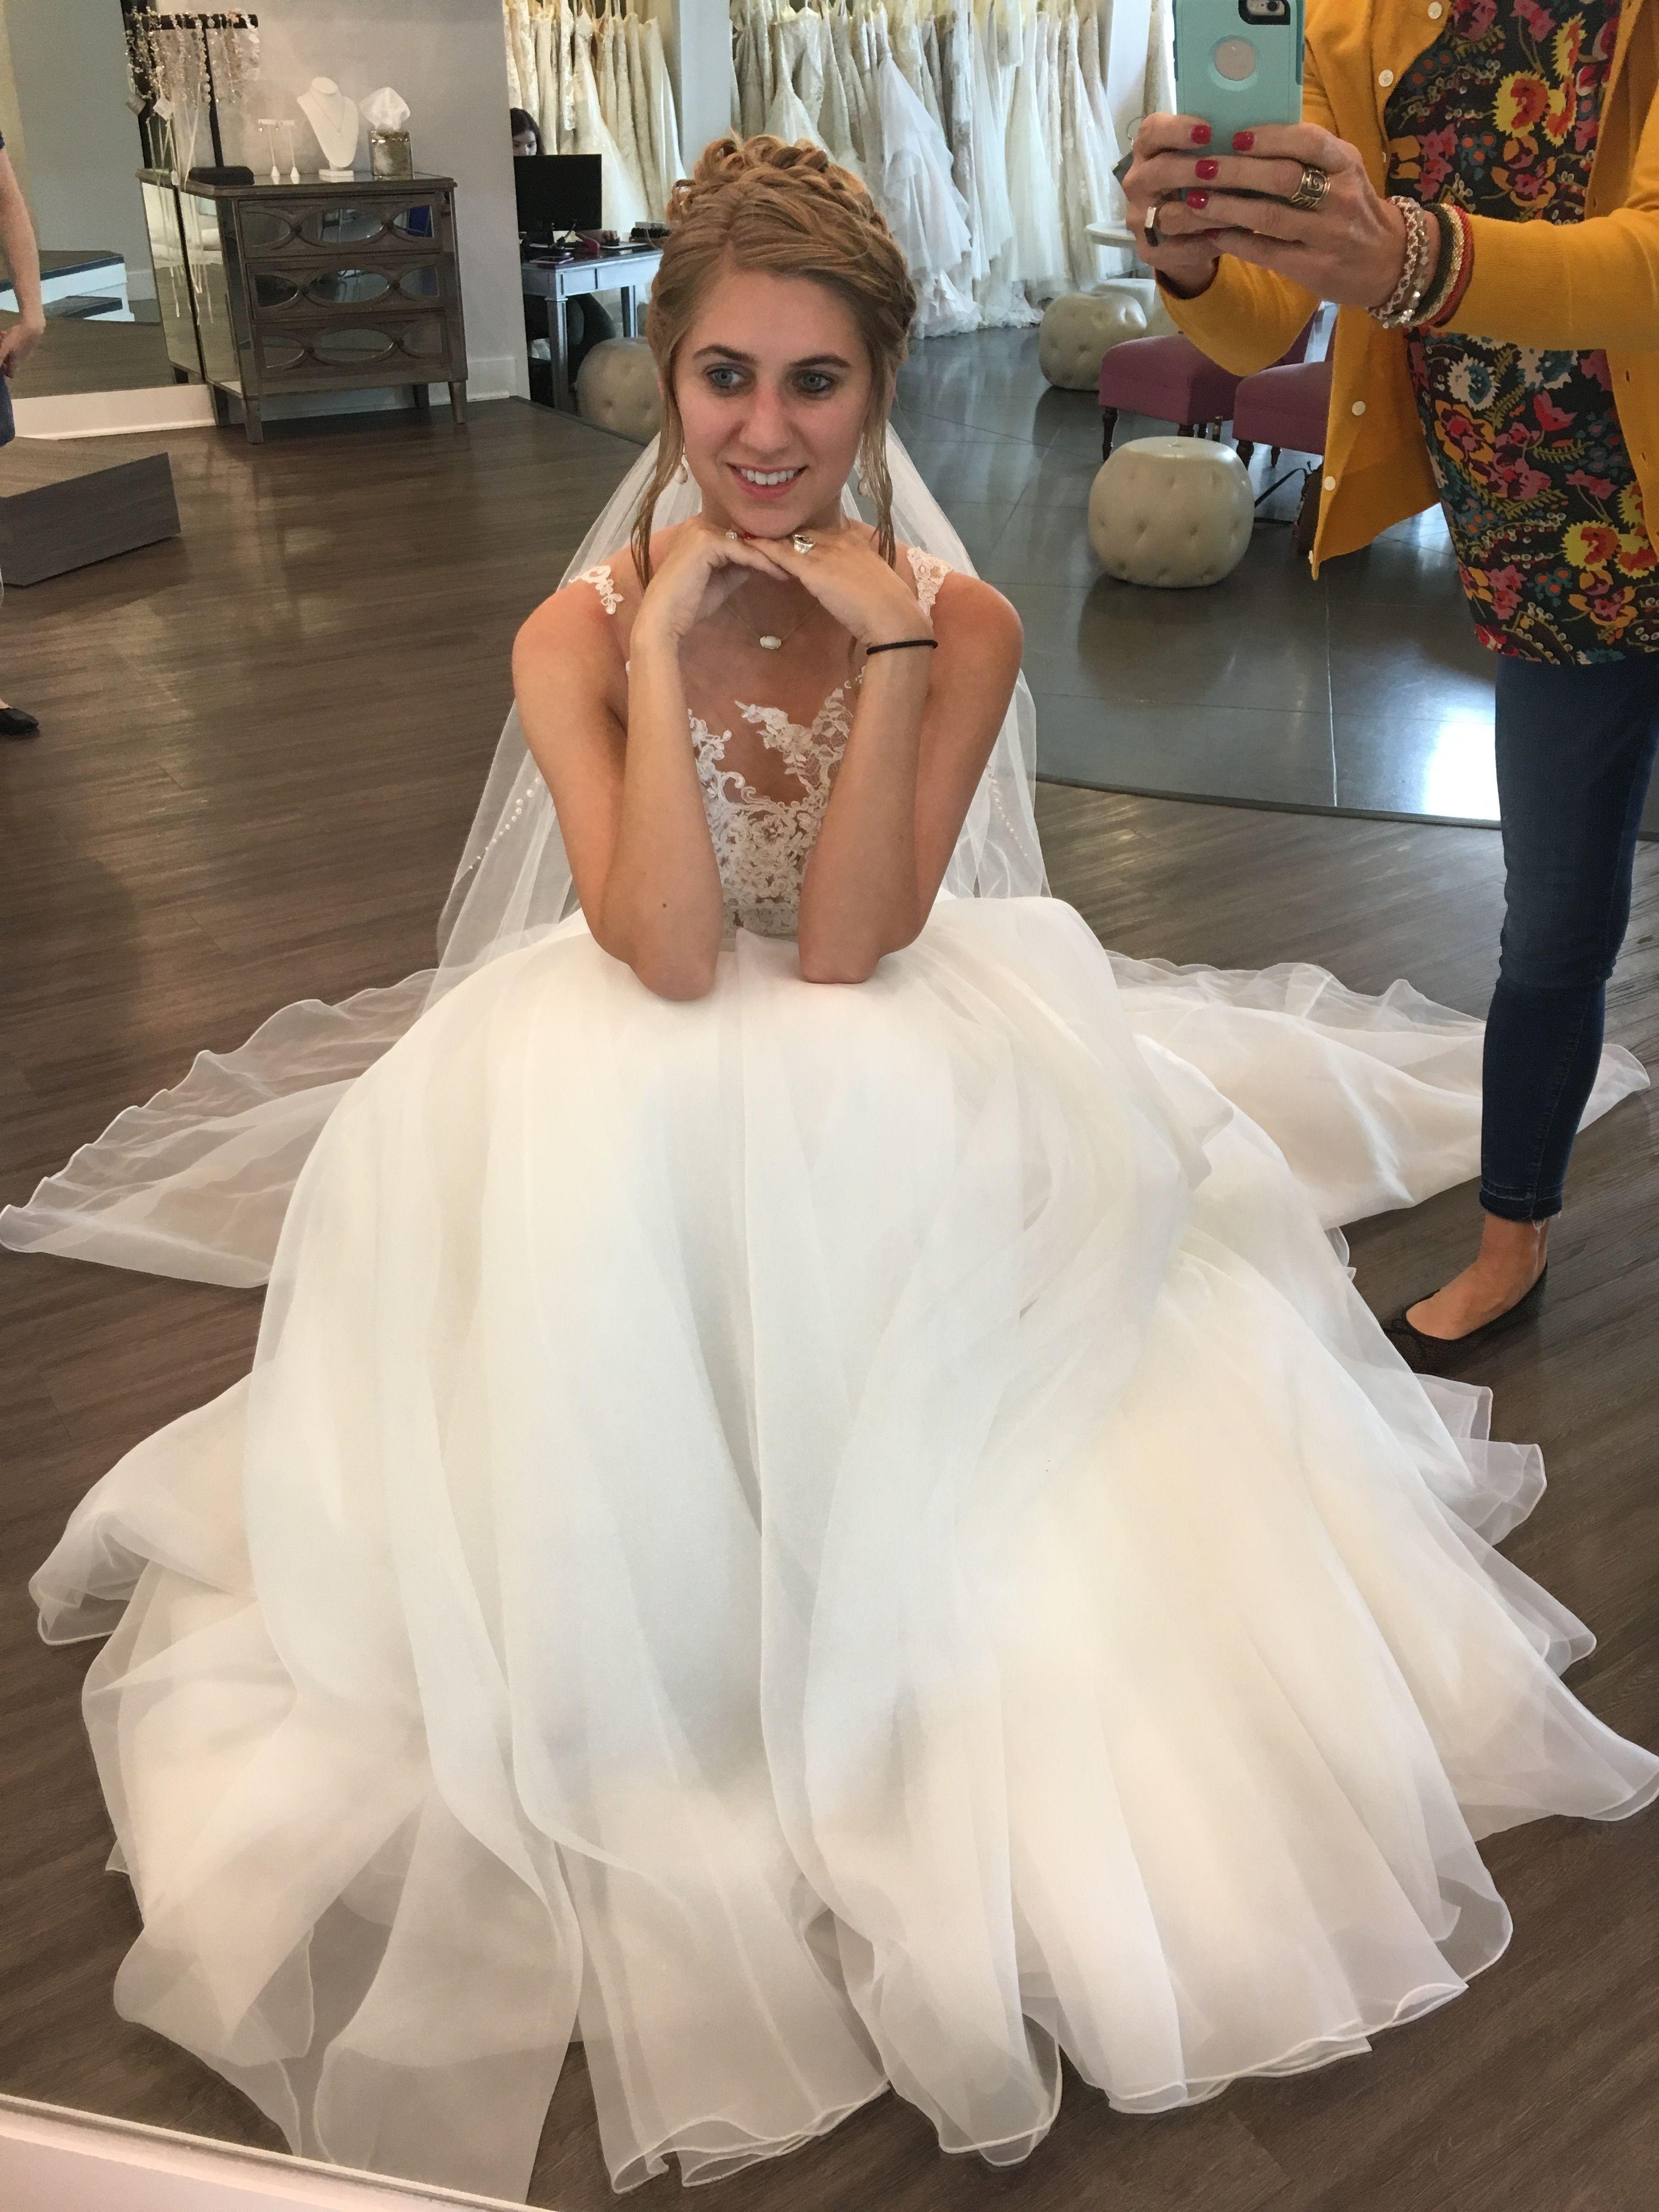 Randy fenoli wedding dresses  Pin by Carly Gipson on Wedding party hair  Pinterest  Wedding